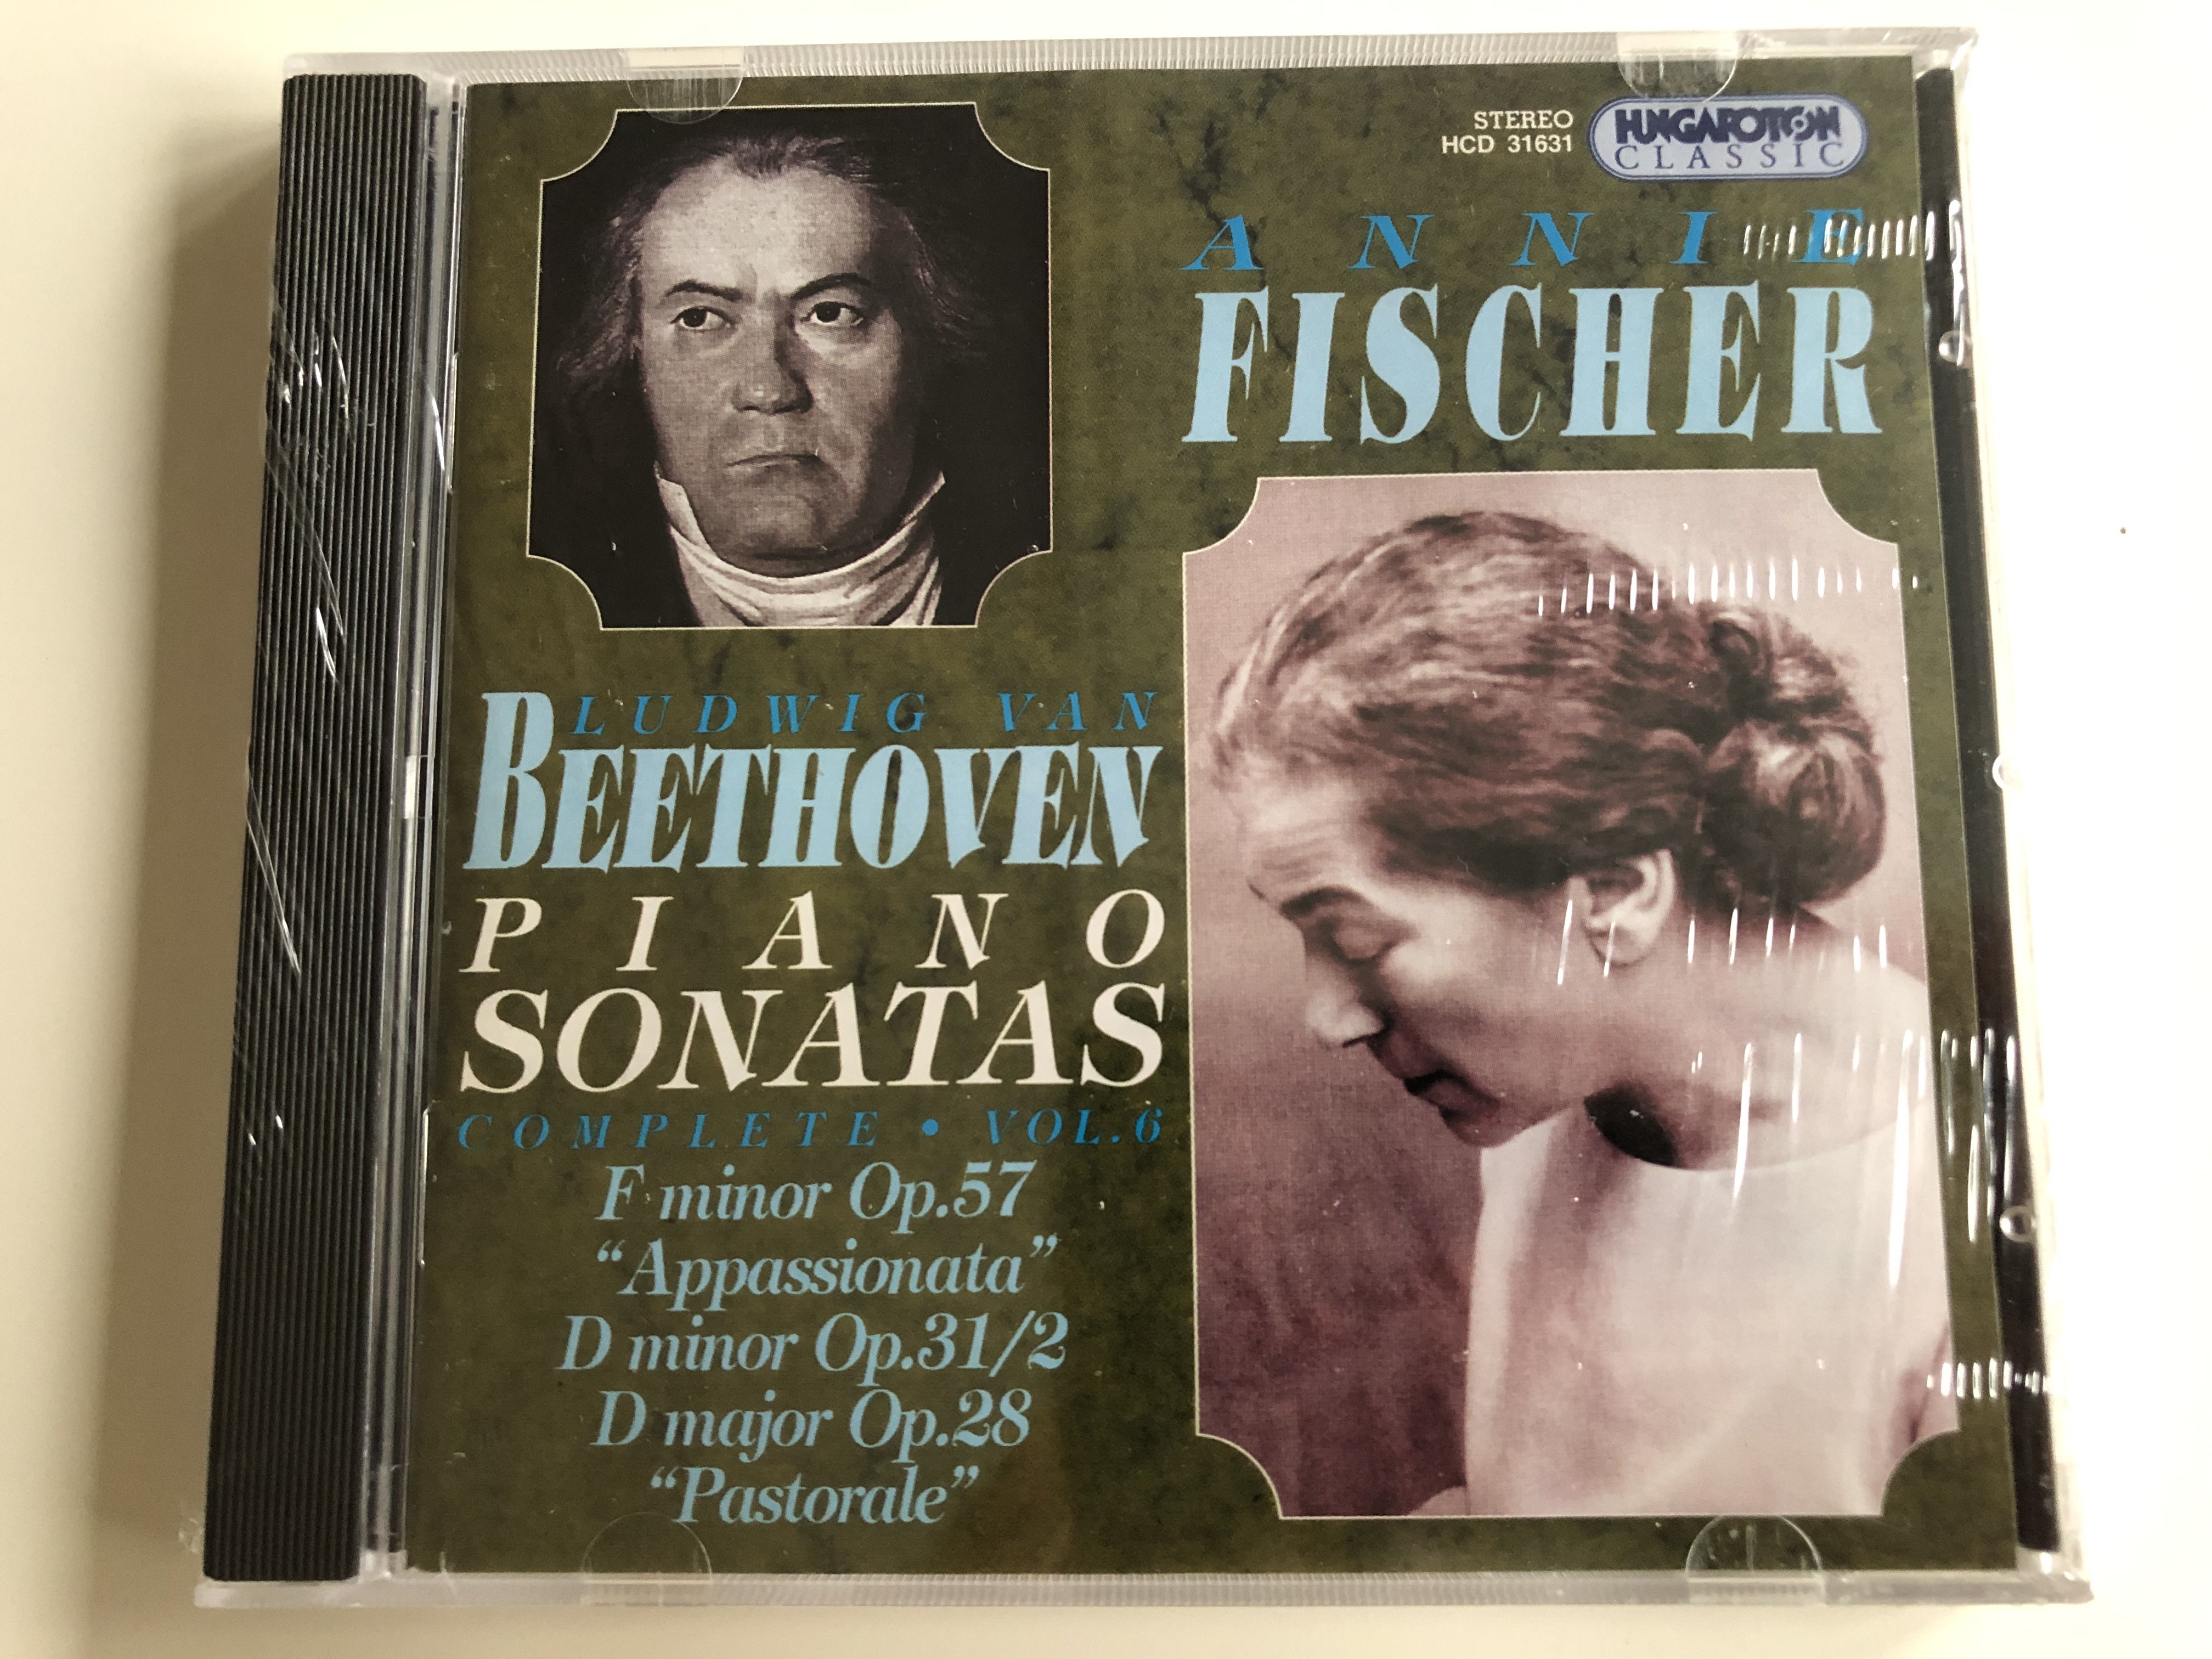 annie-fischer-ludwig-van-beethoven-piano-sonatas-complete-vol.-6-audio-cd-1997-hungaroton-classic-hcd-31631-1-.jpg